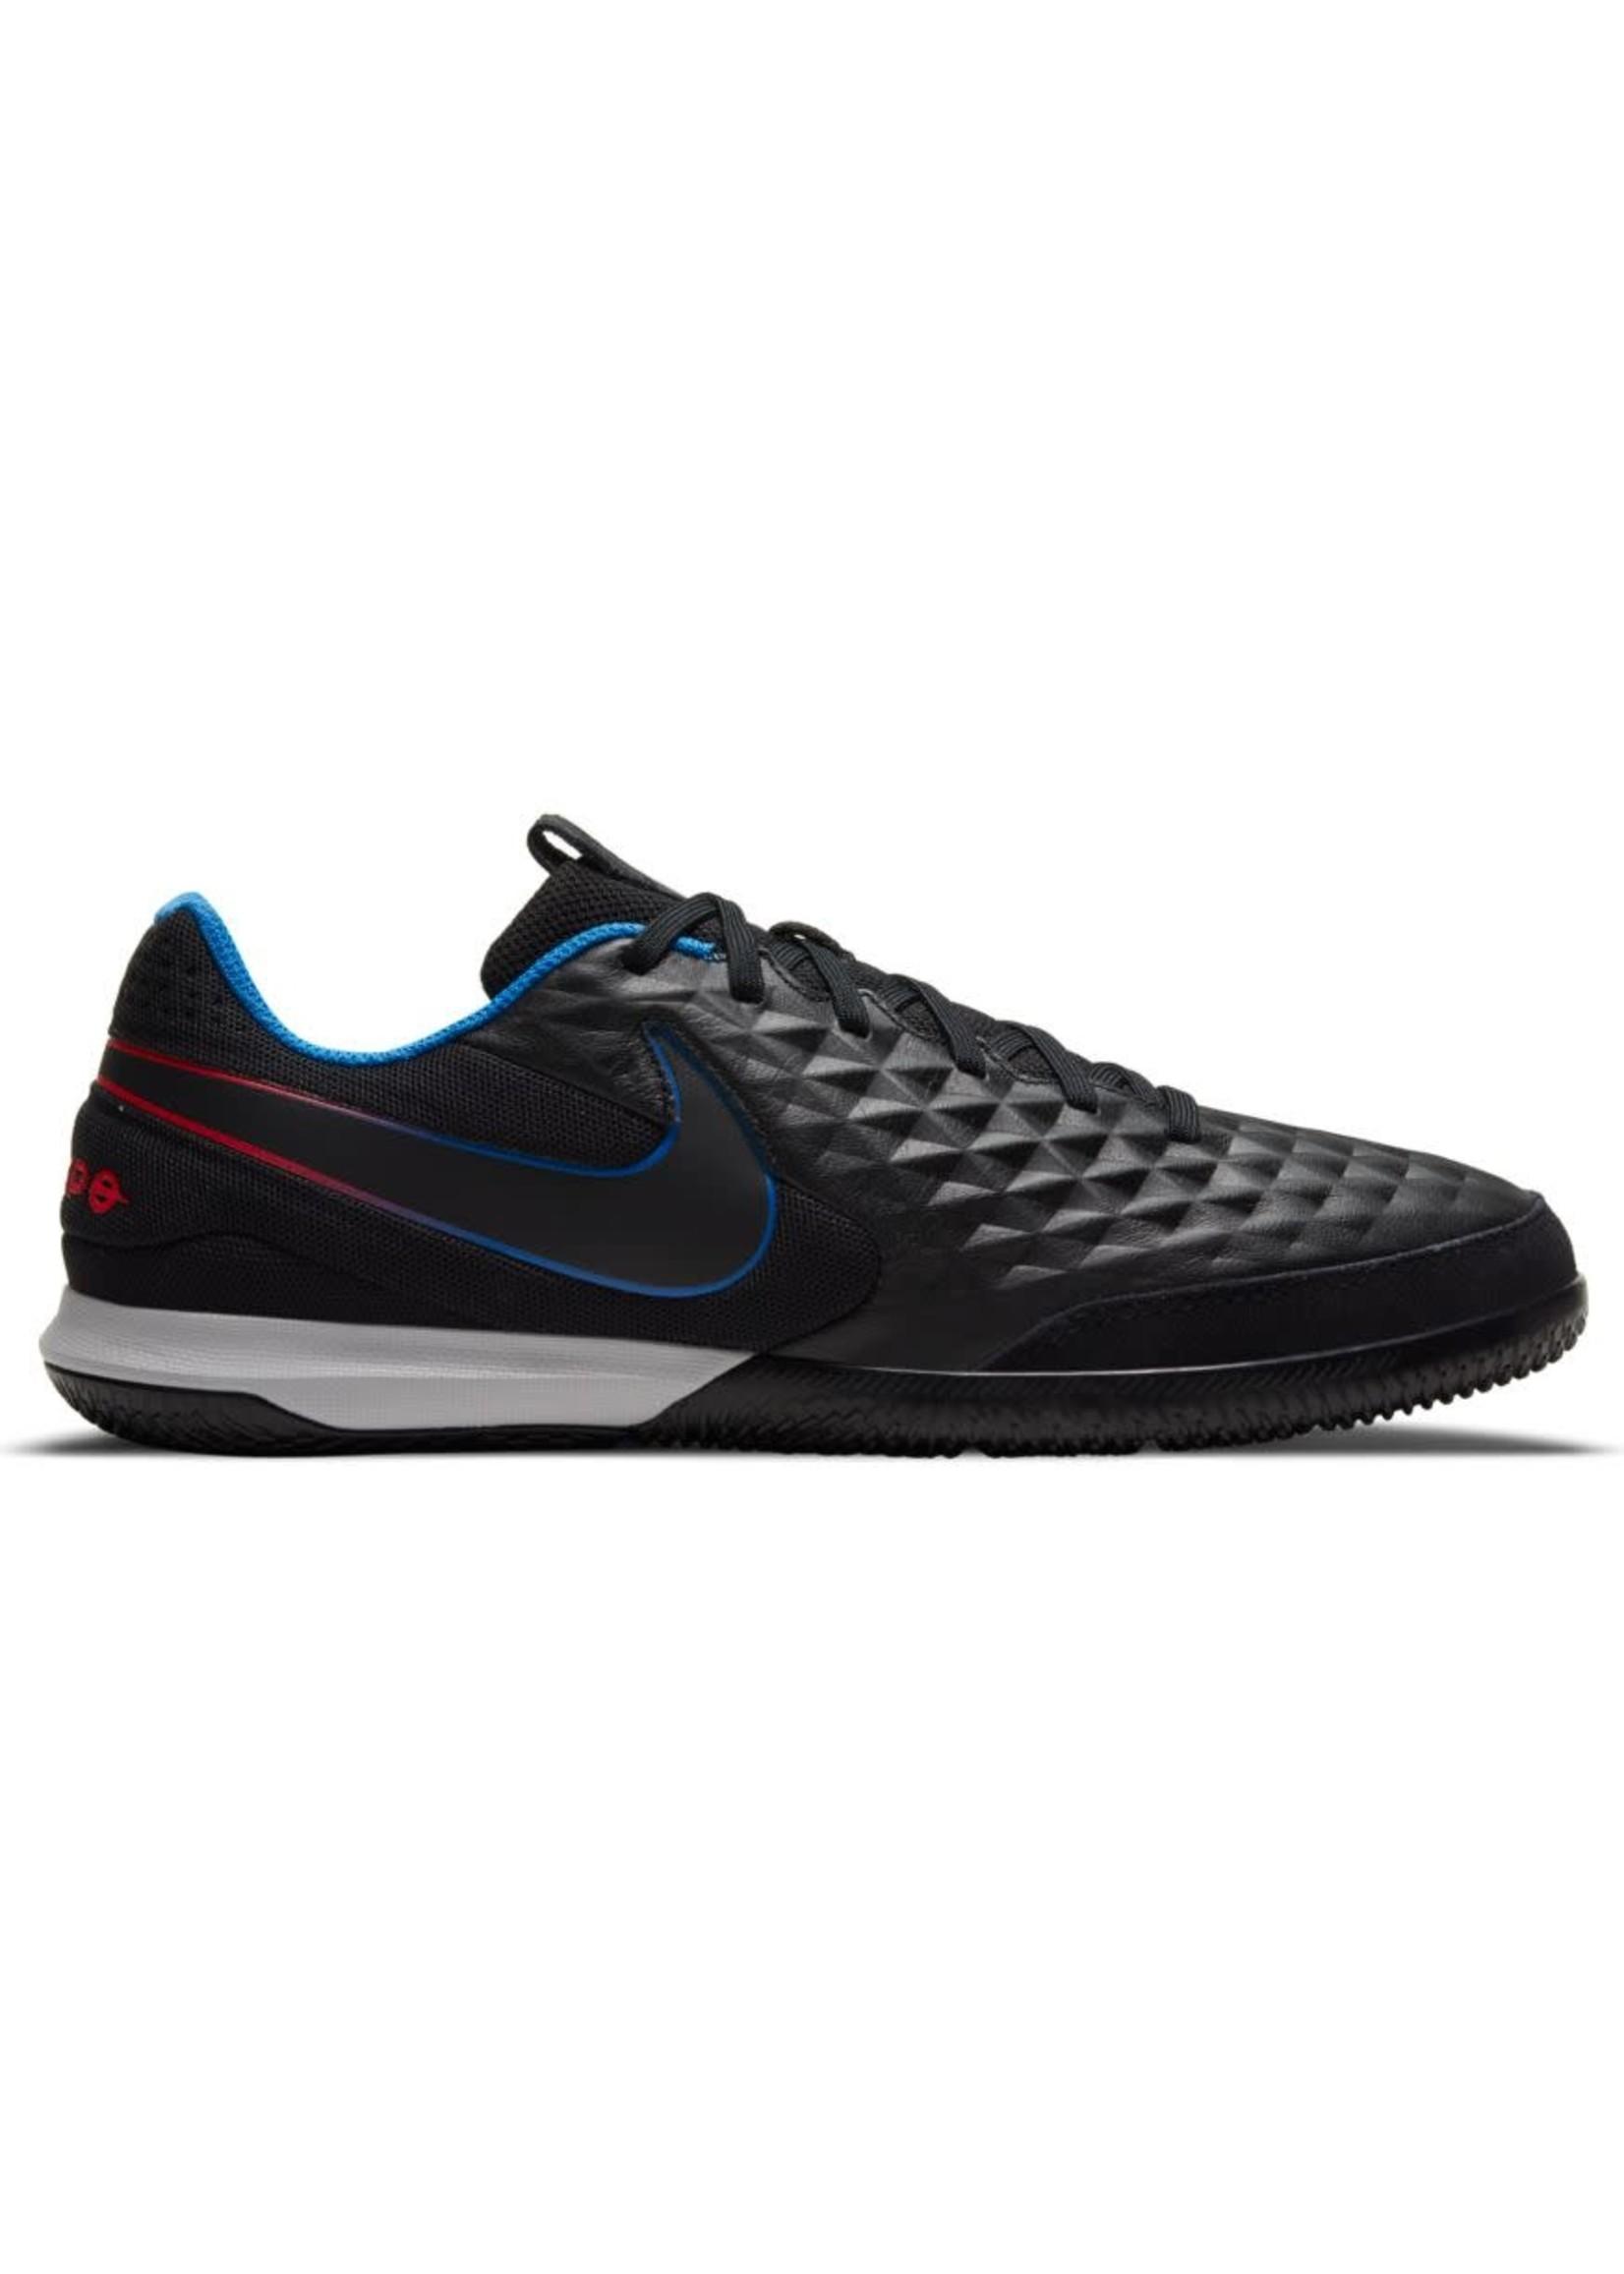 Nike Legend 8 Academy IC - Black/Blue/Red